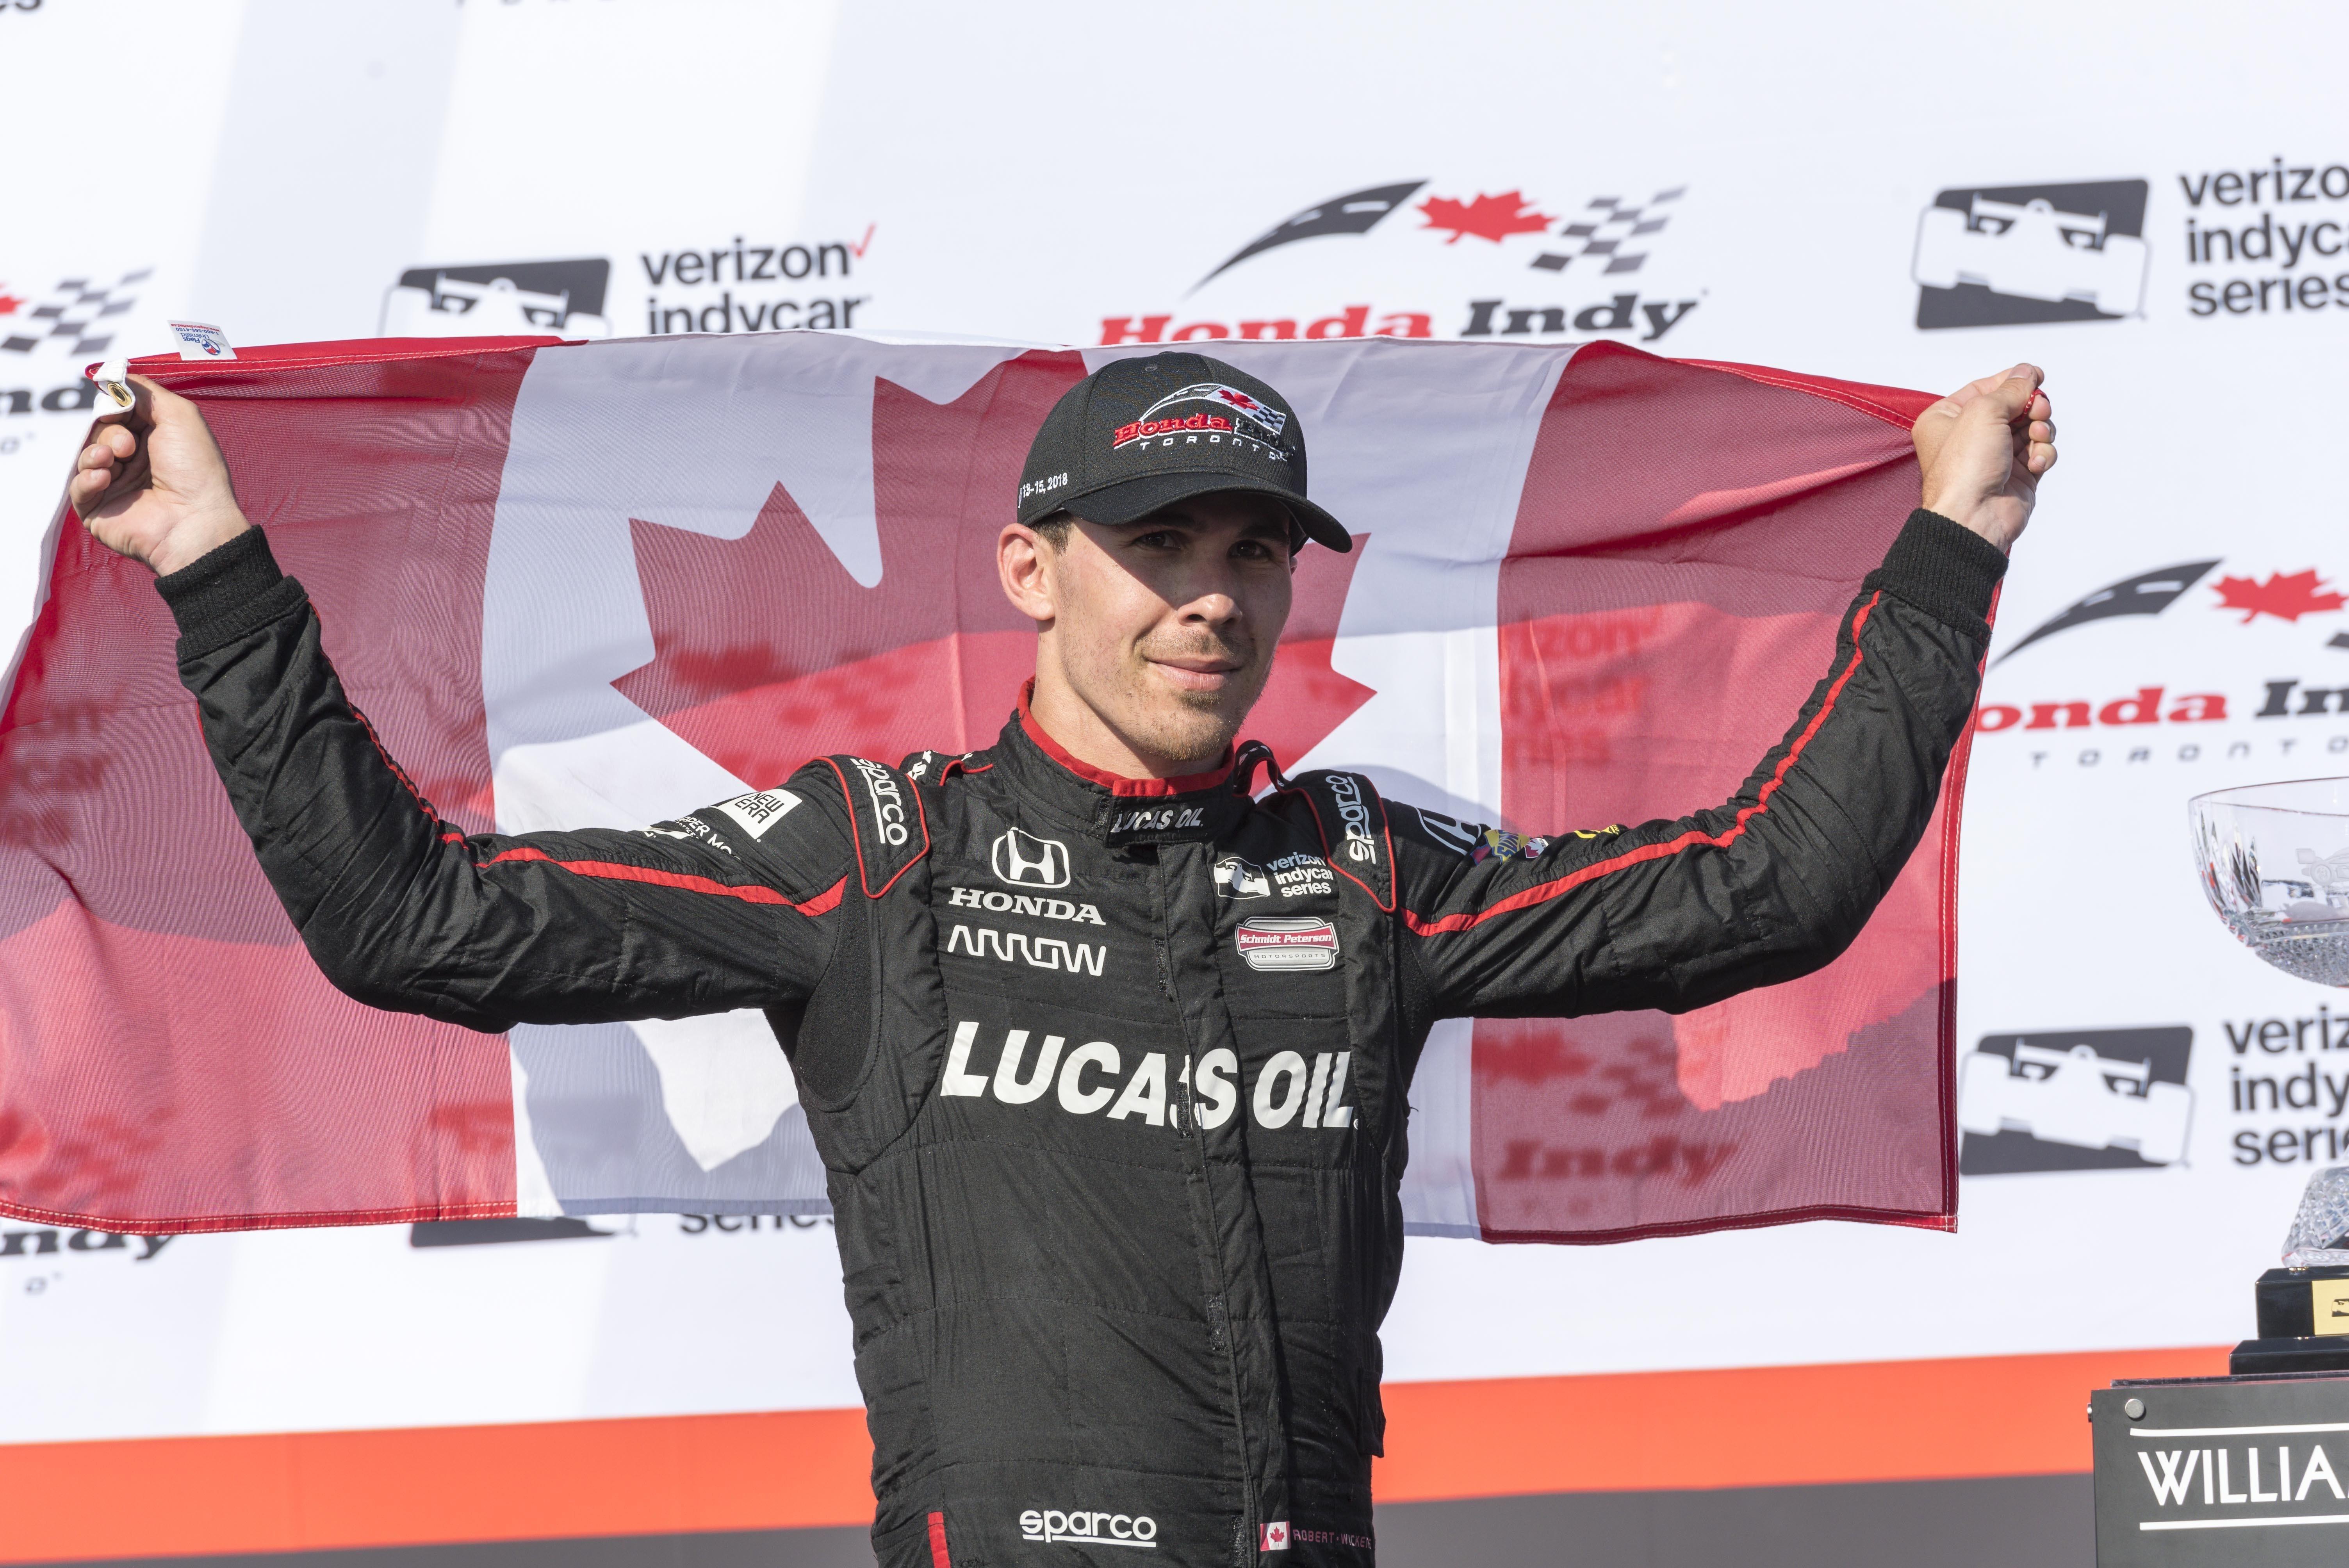 Watch Wickens' return to racing